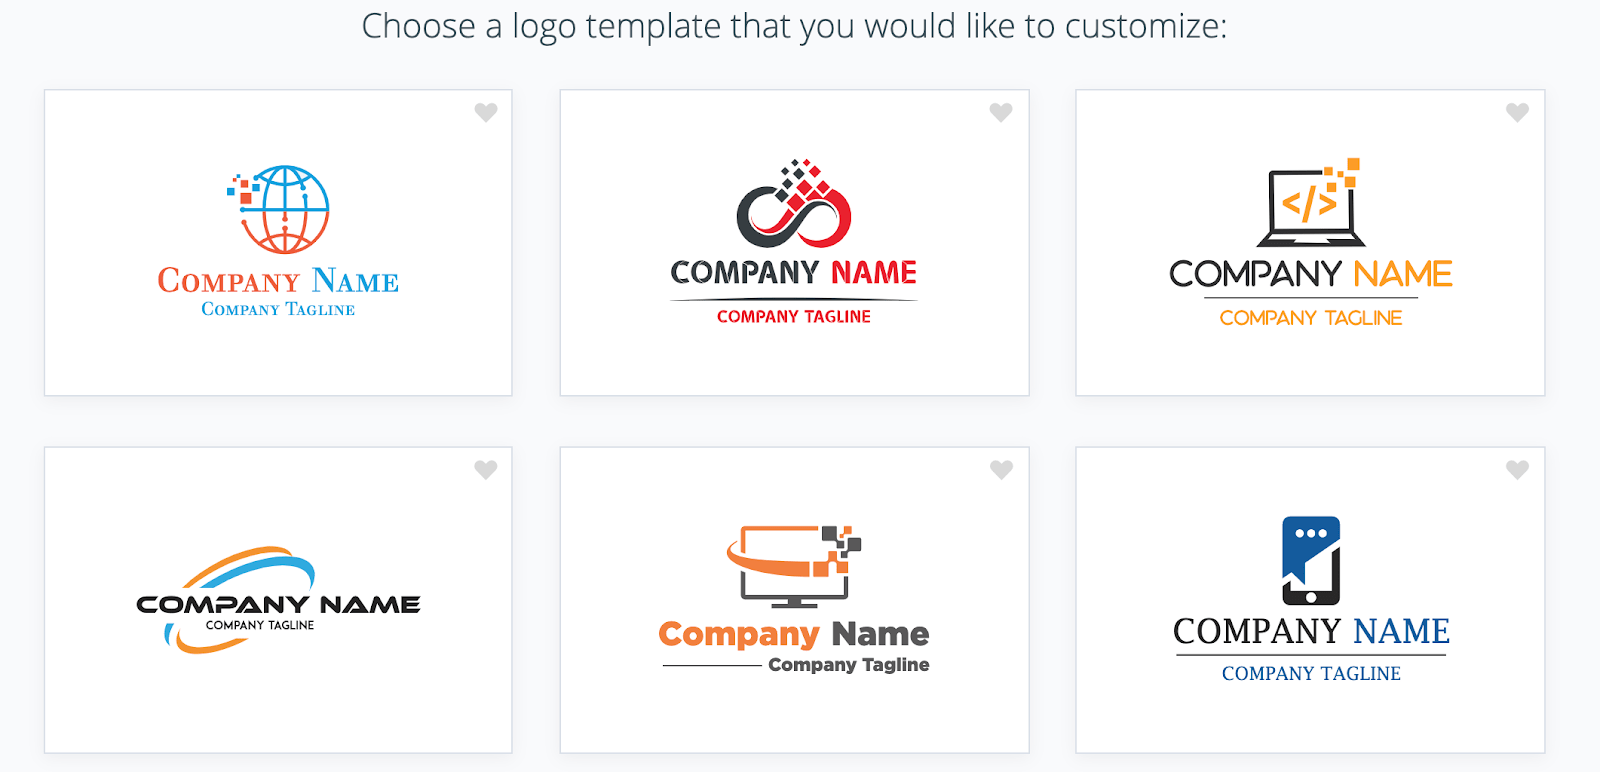 Logogenie's marketing logo templates